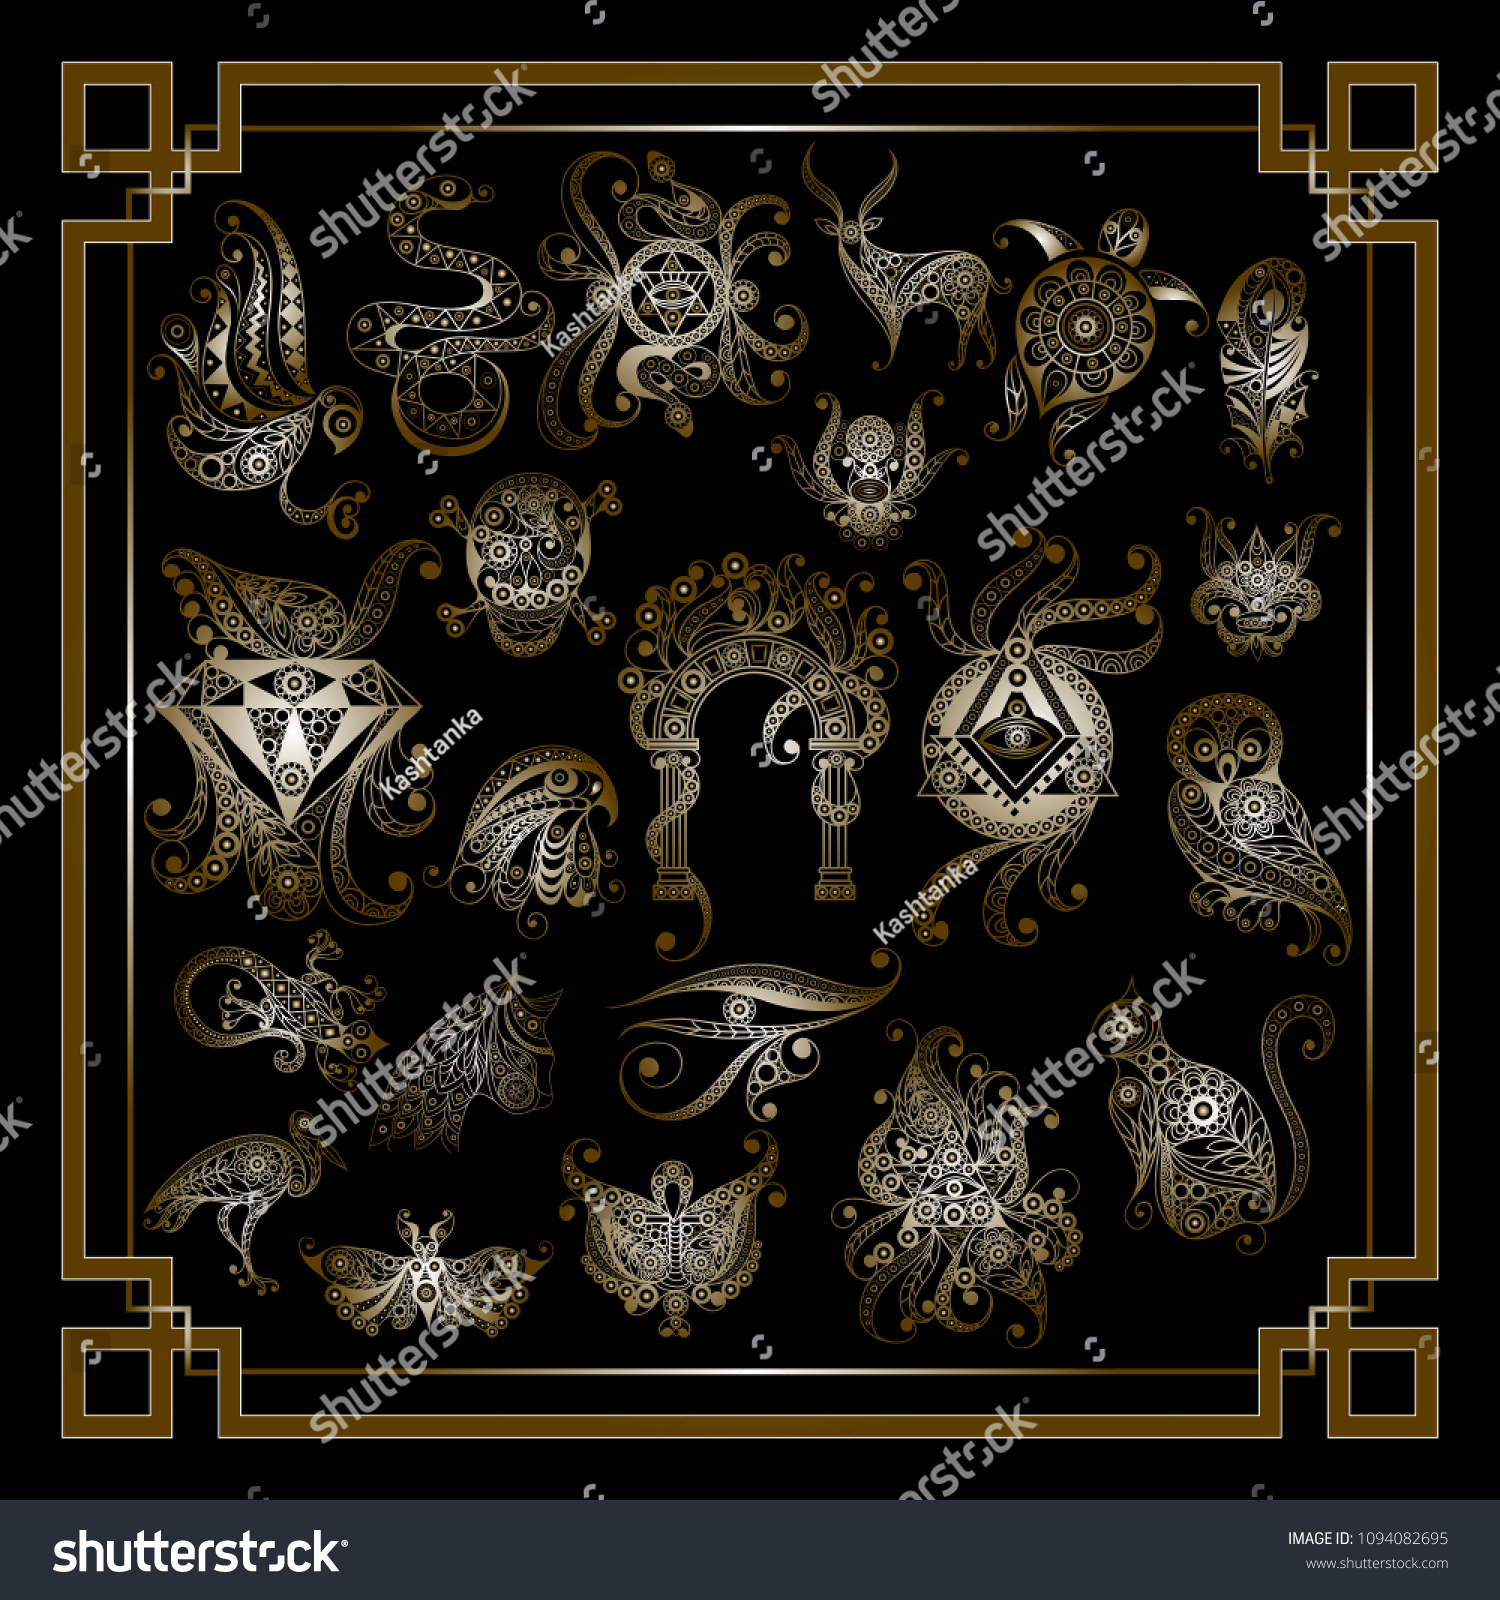 Graphic Abstract Design Occult Symbolsset Masonic Stock Vector